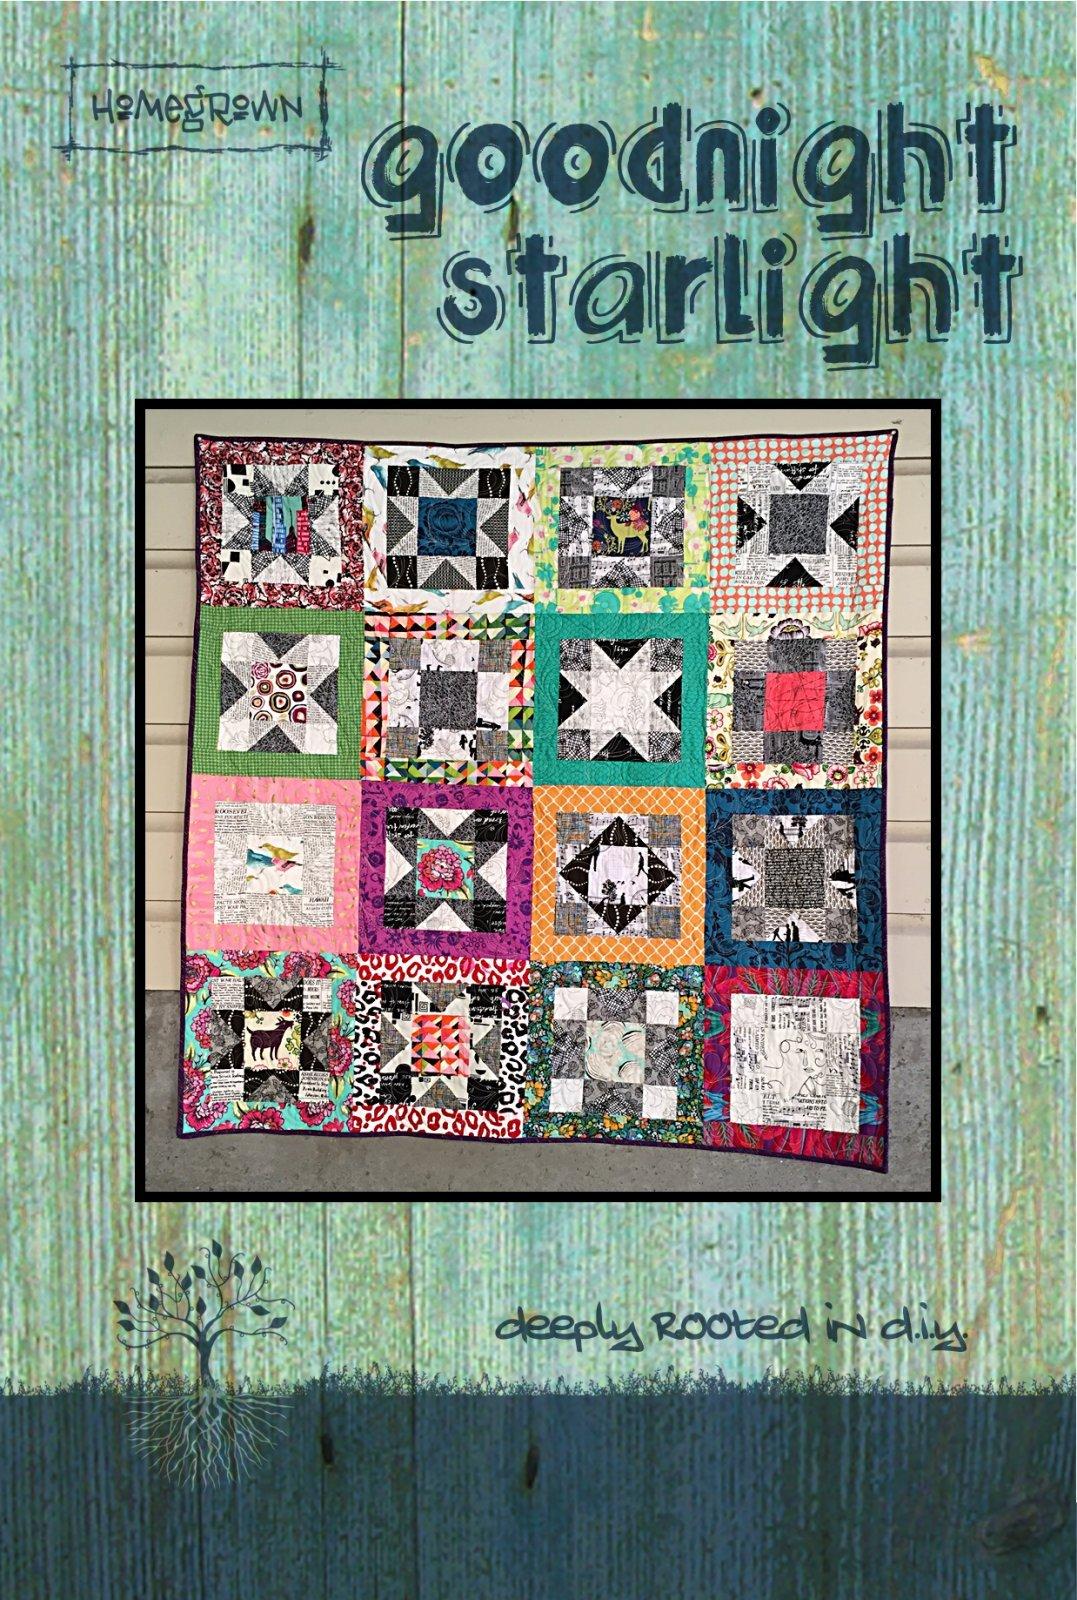 Goodnoght Starlight Pattern